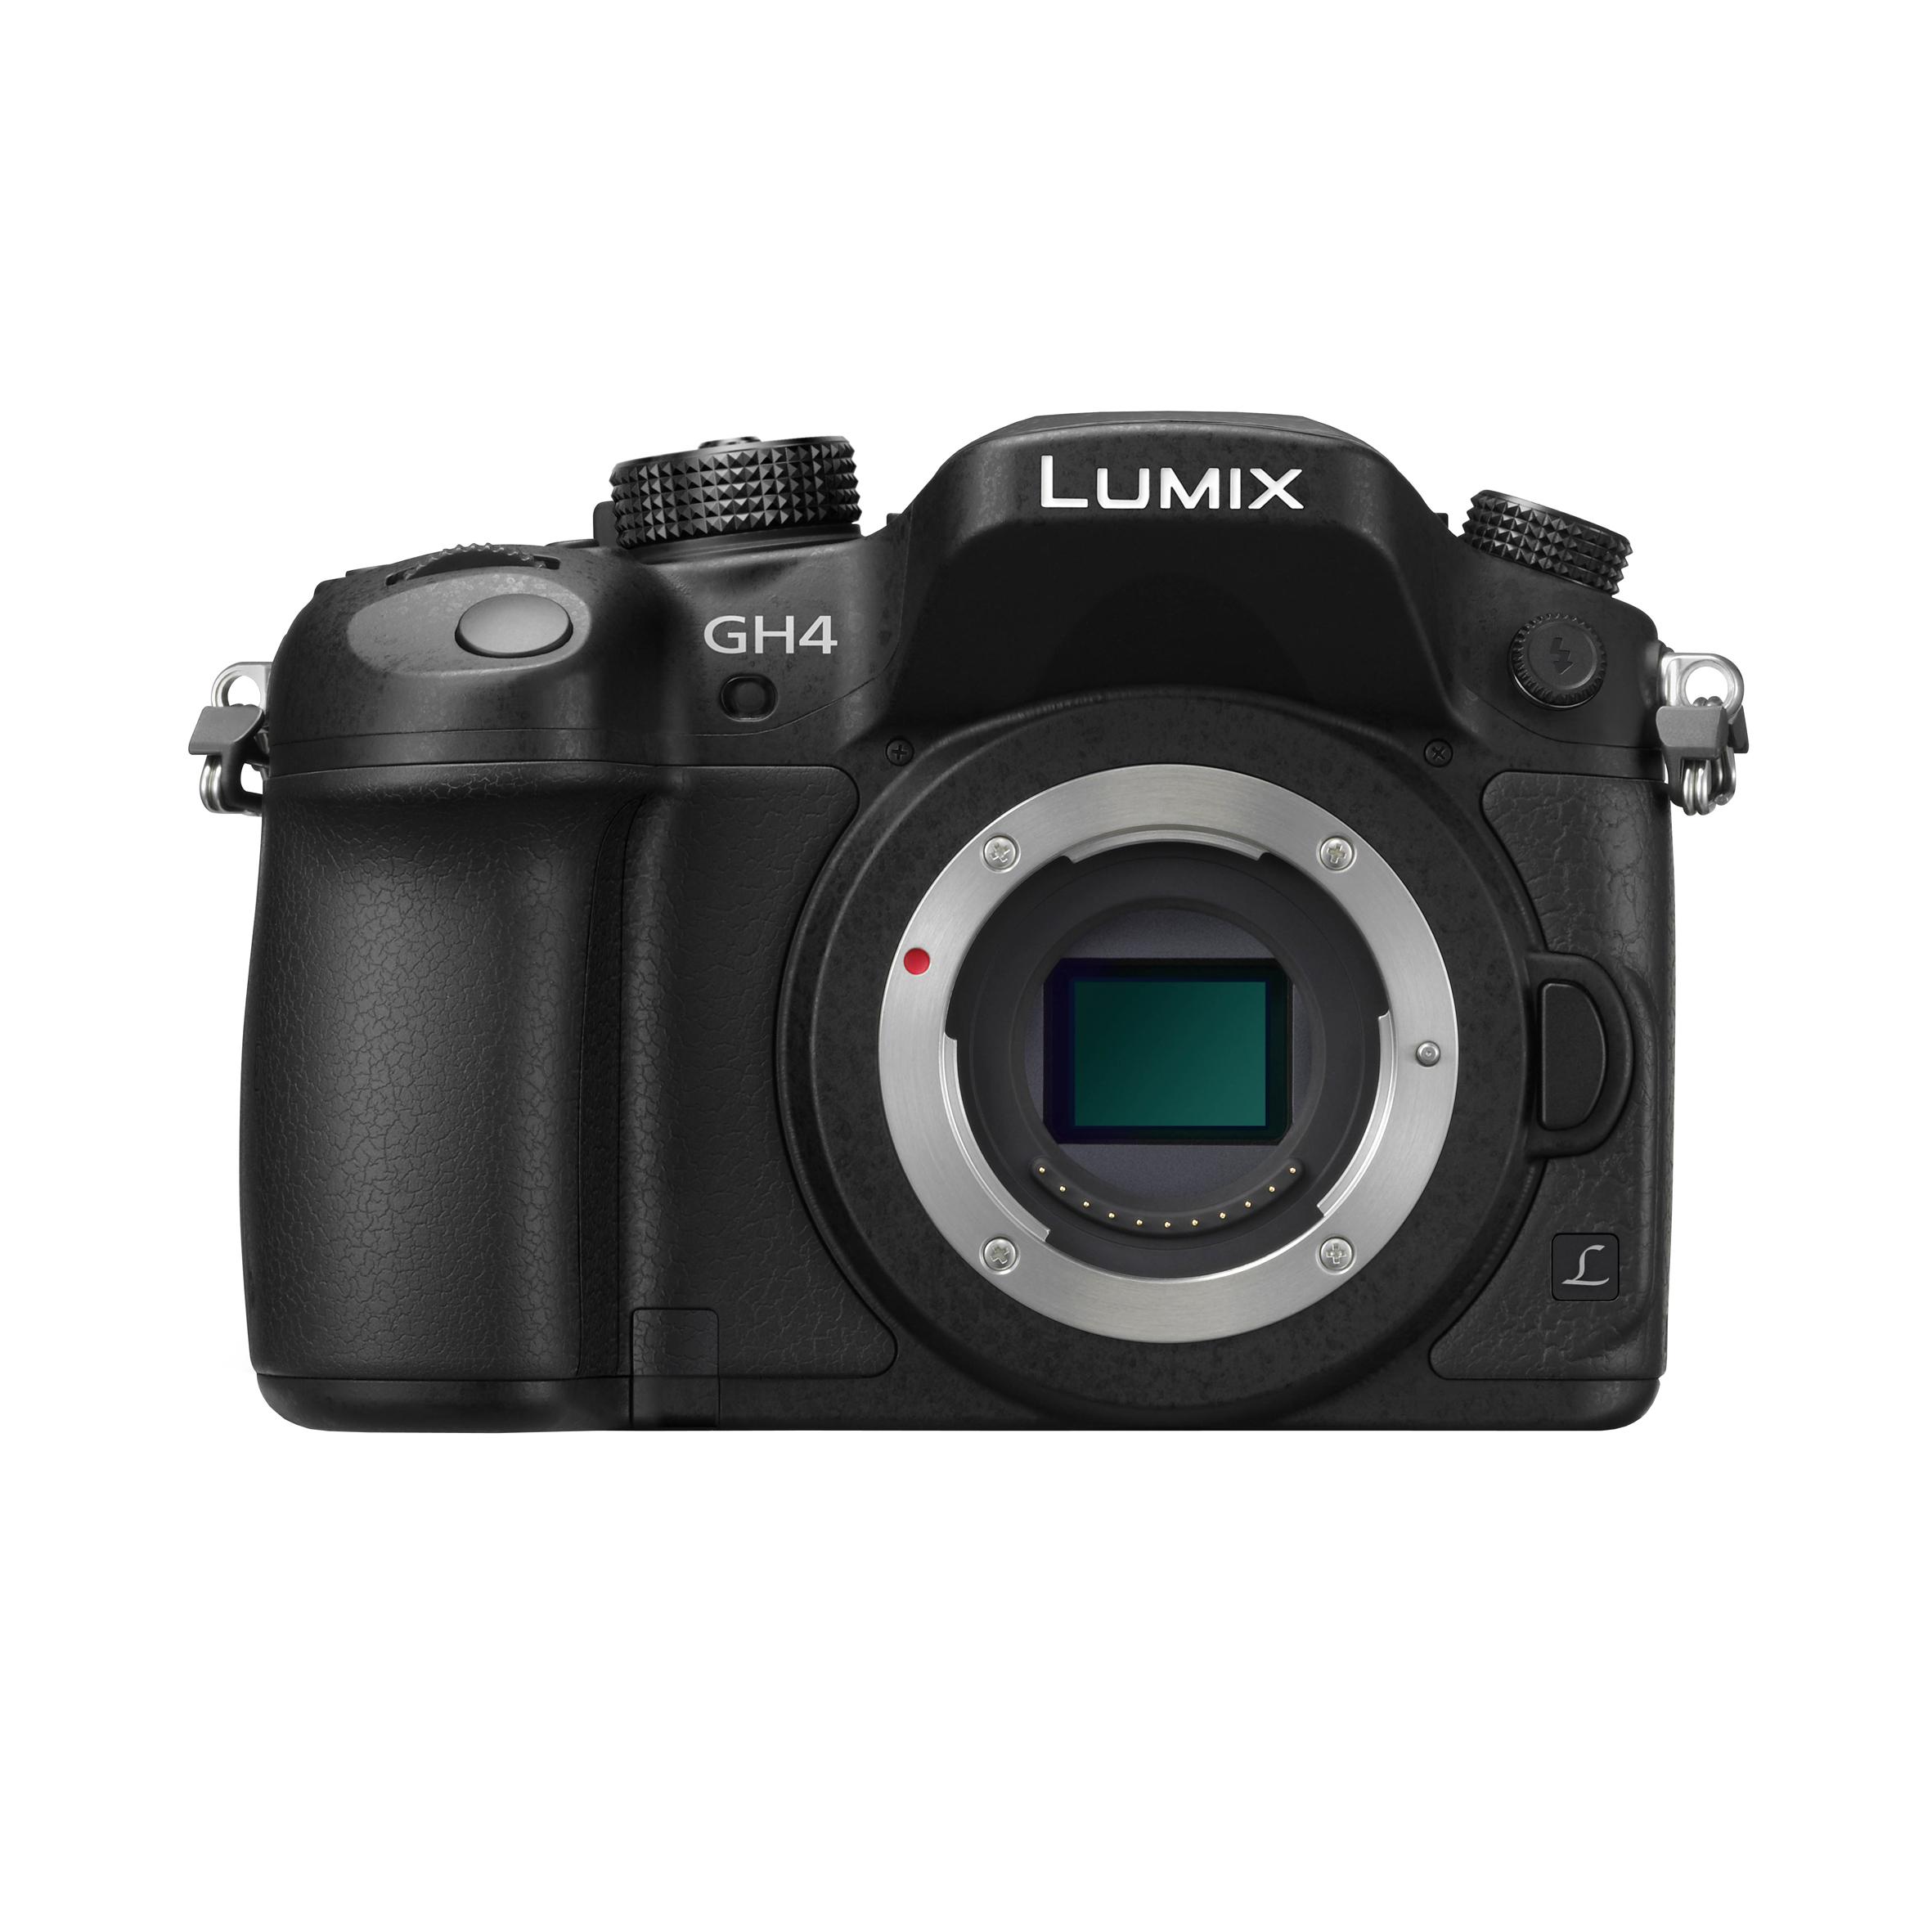 [foto gregor gruppe] Panasonic Lumix DMC-GH4 Gehäuse - Spiegellose Systemkamera Micro-Four-Thirds